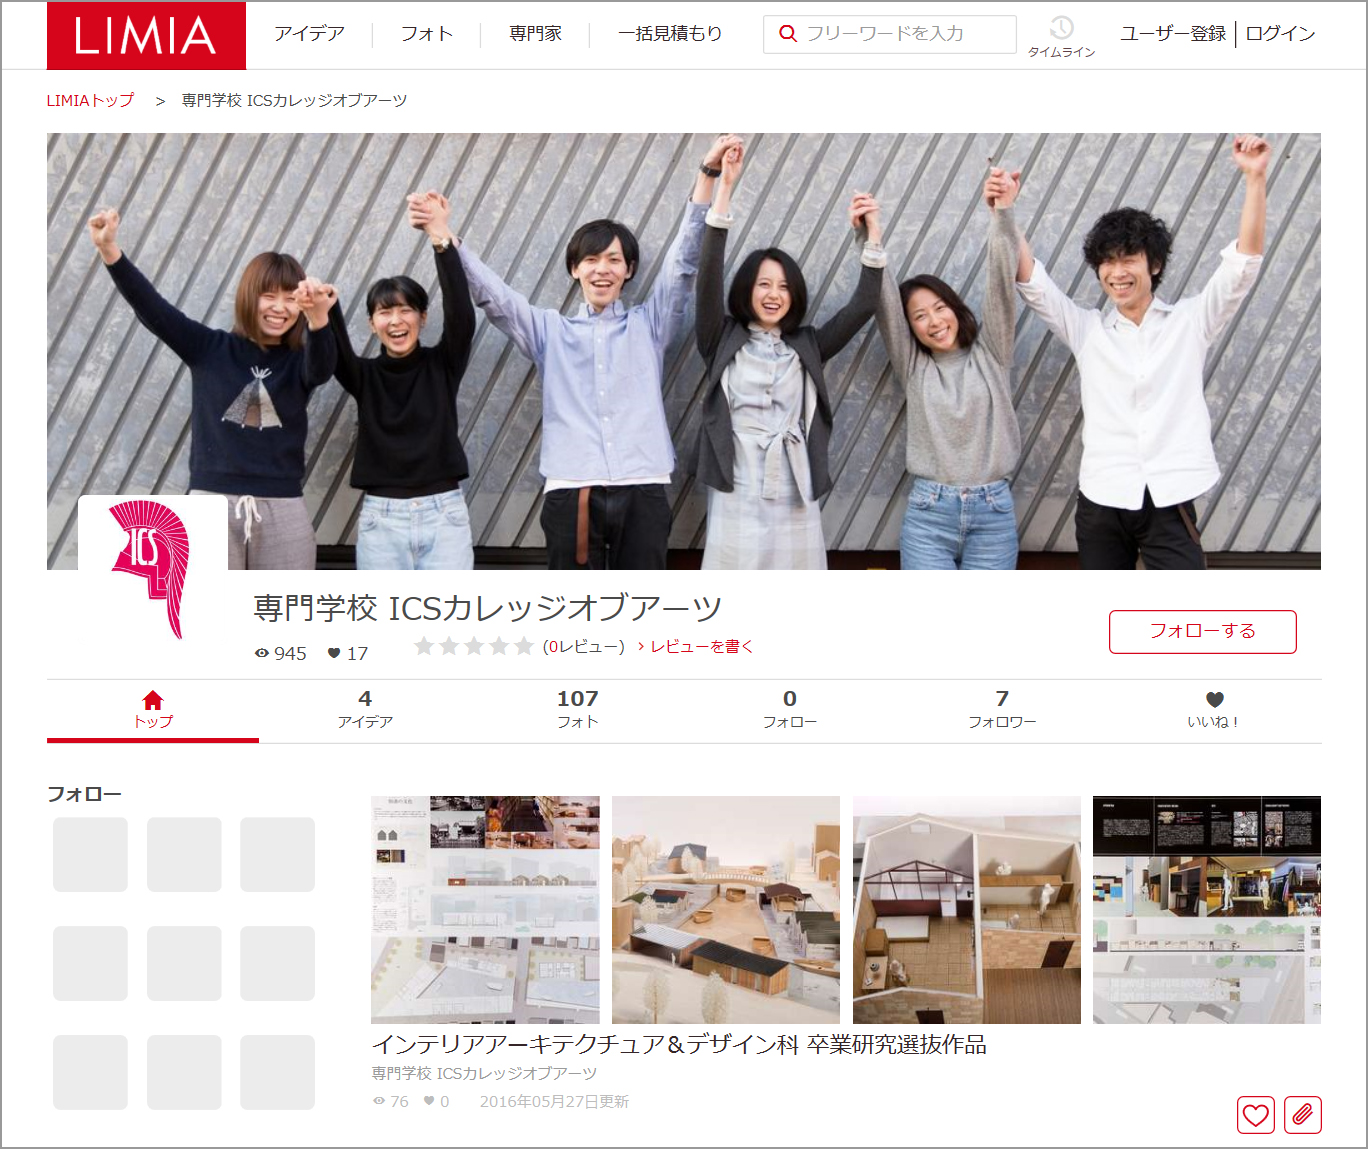 LIMIA Webサイト_キャプチャ_トリミング